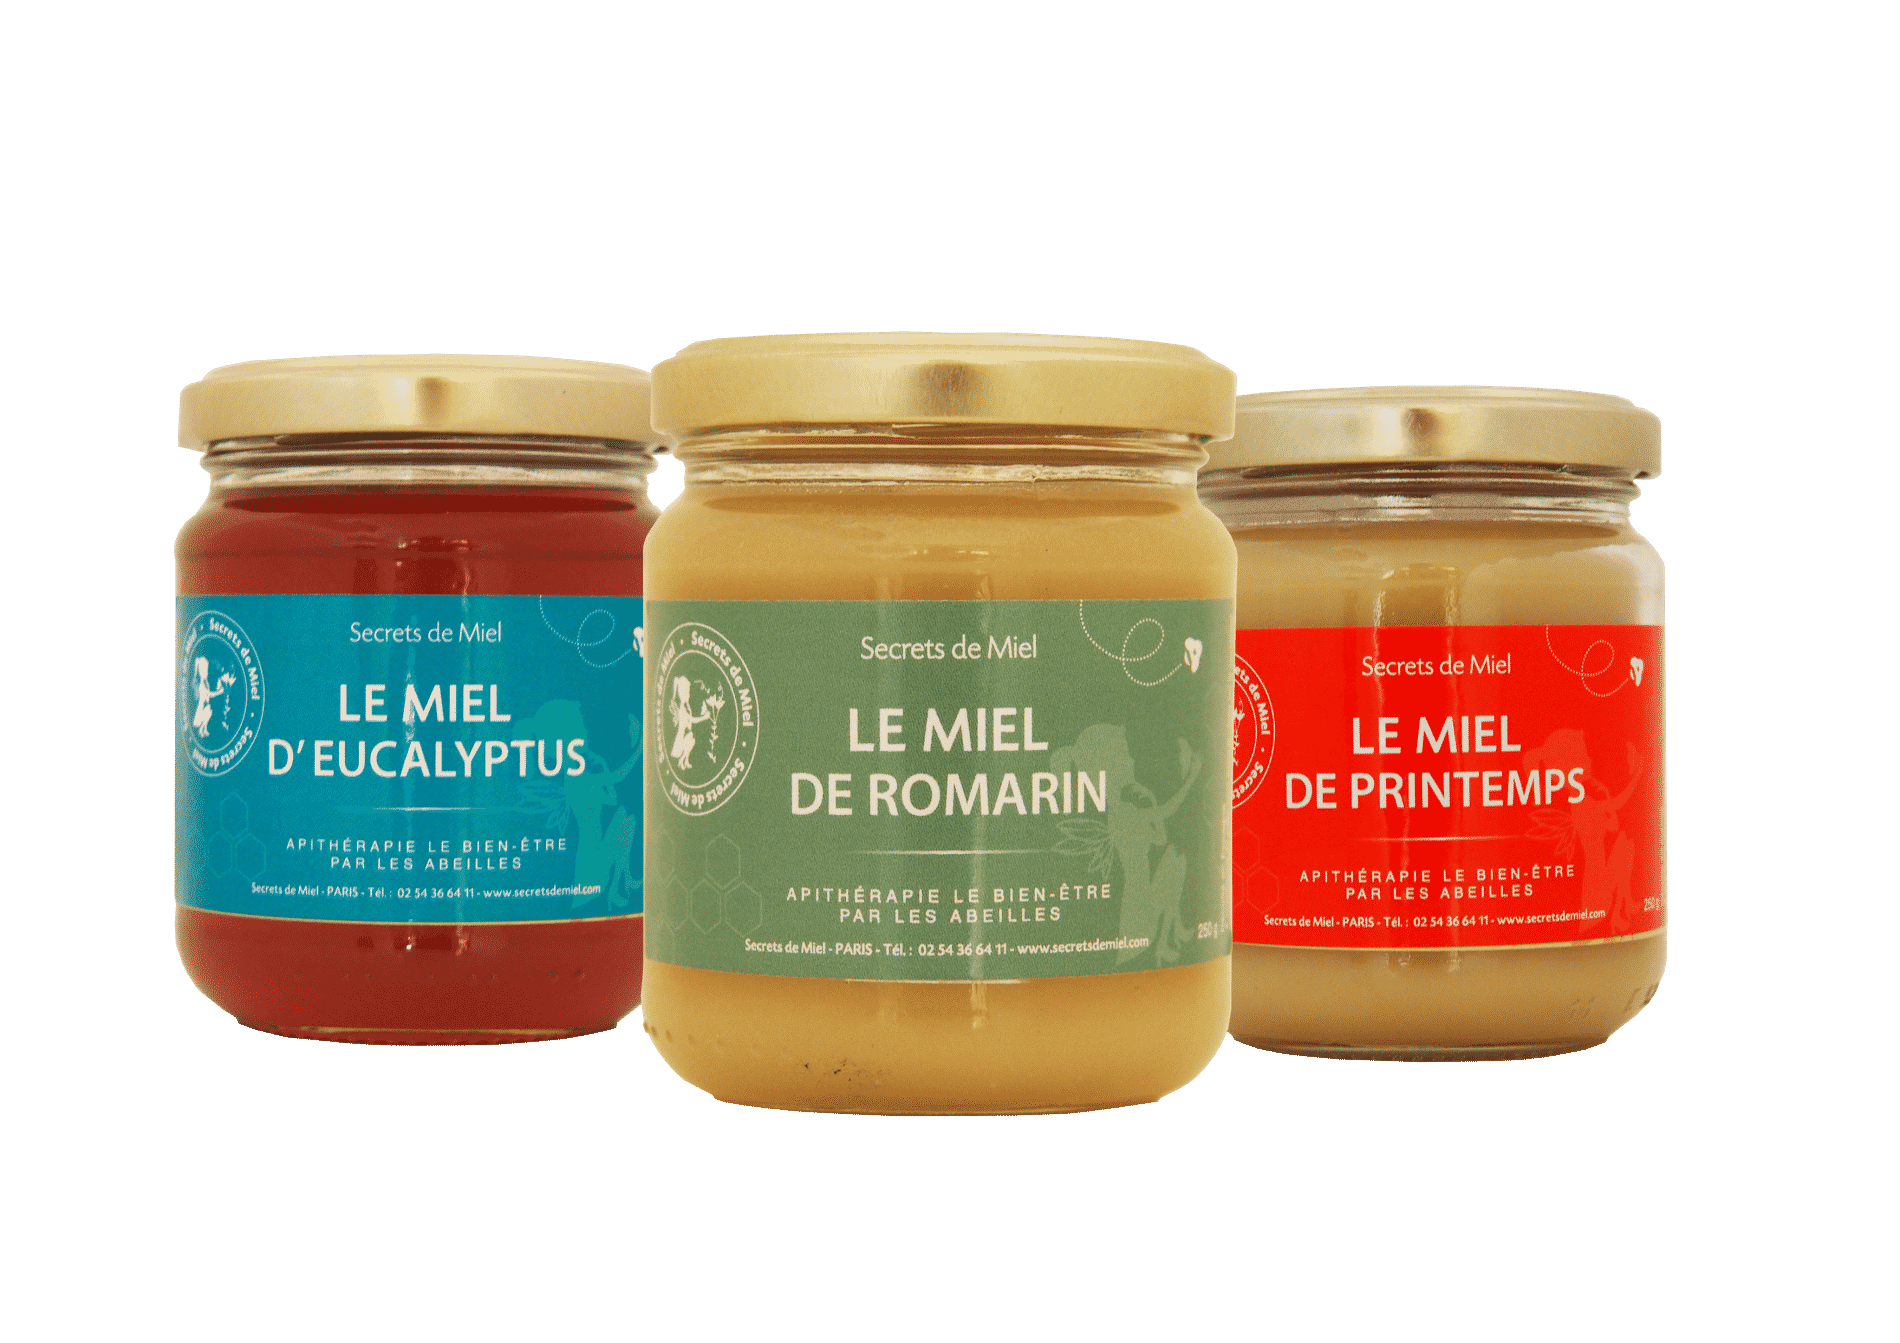 miels - haute de gamme -apiculture - gourmet - nature